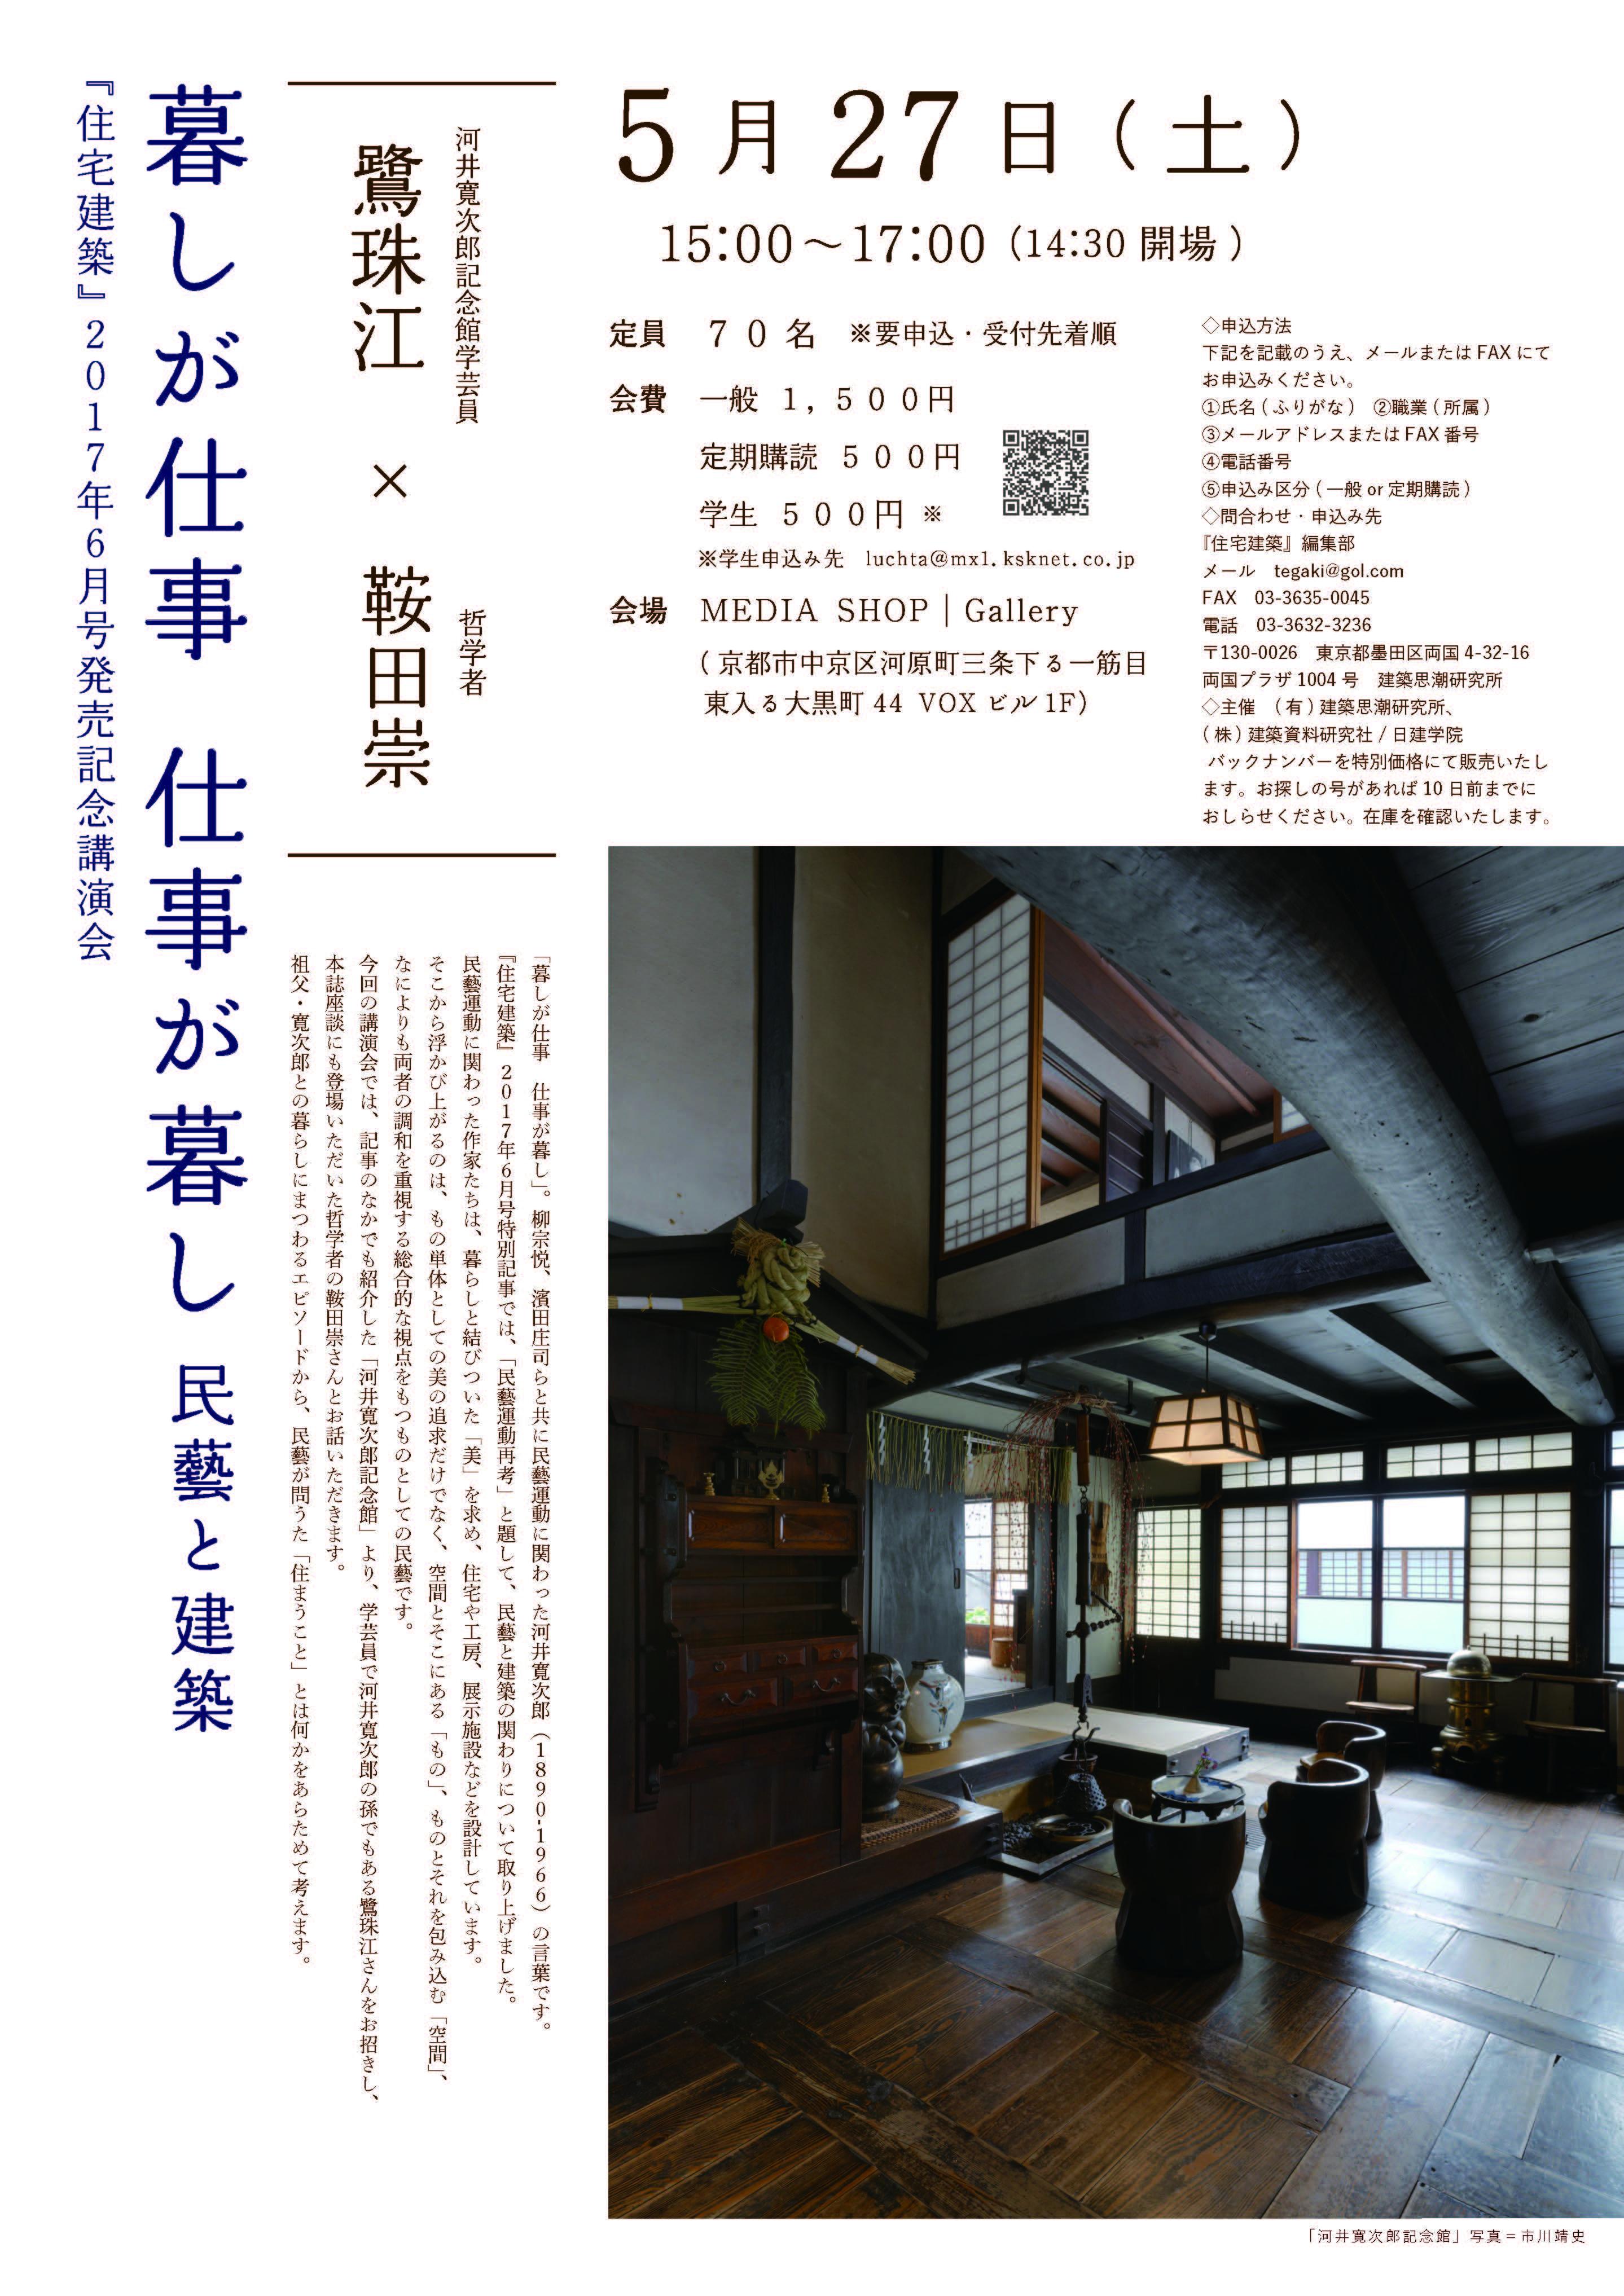 住宅建築 6月号発売記念講演会「暮しが仕事 仕事が暮し」